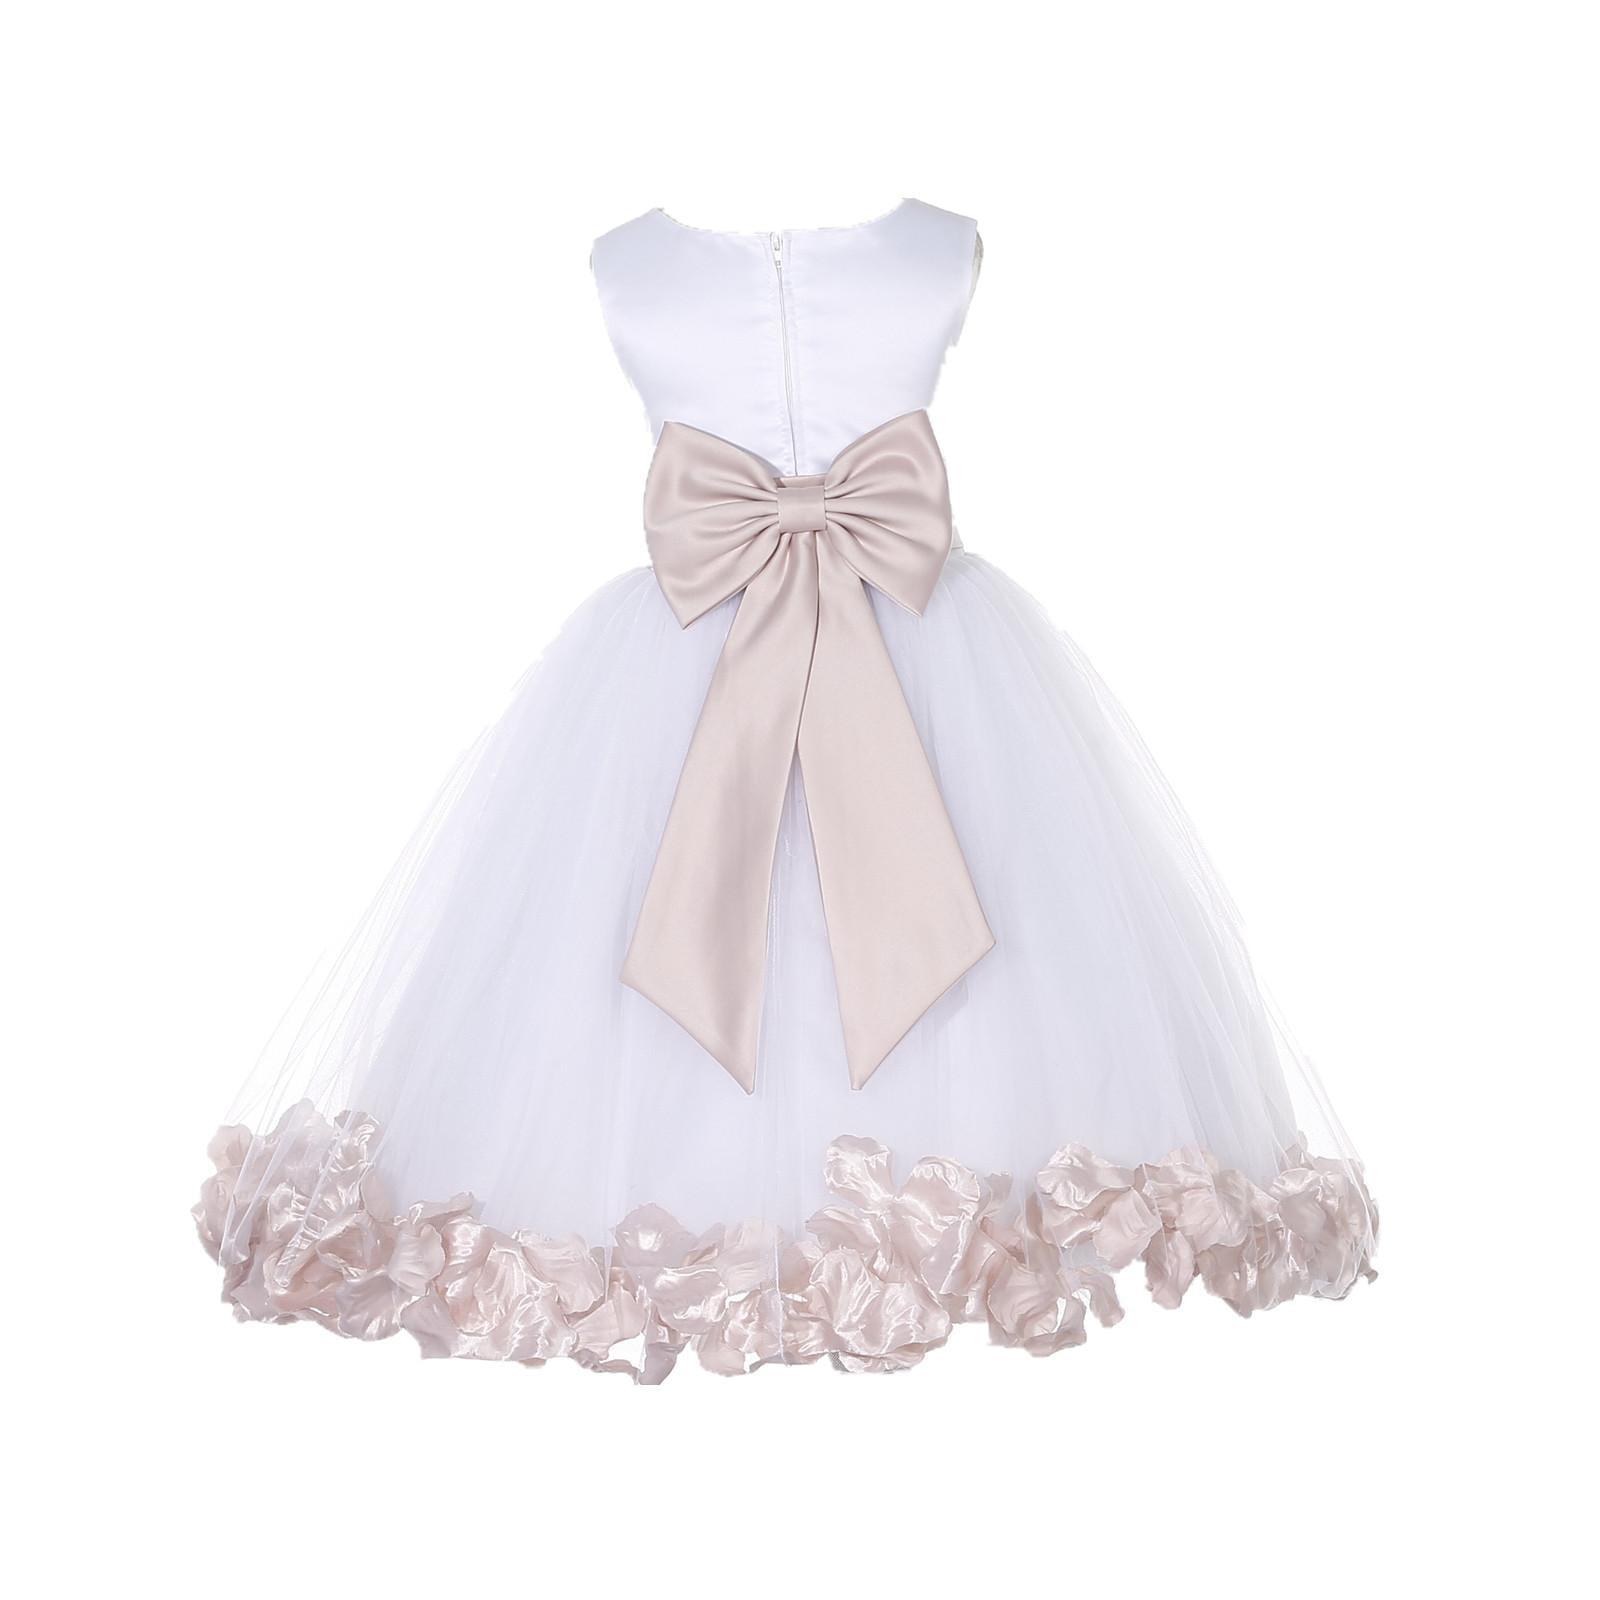 f3ab6ae2d864 Ekidsbridal Wedding Pageant Rose Petals White Tulle Flower Girl Dress  Toddler Junior Bridesmaid Recital Easter Holiday Gown Birthday Girl Dress  Communion ...